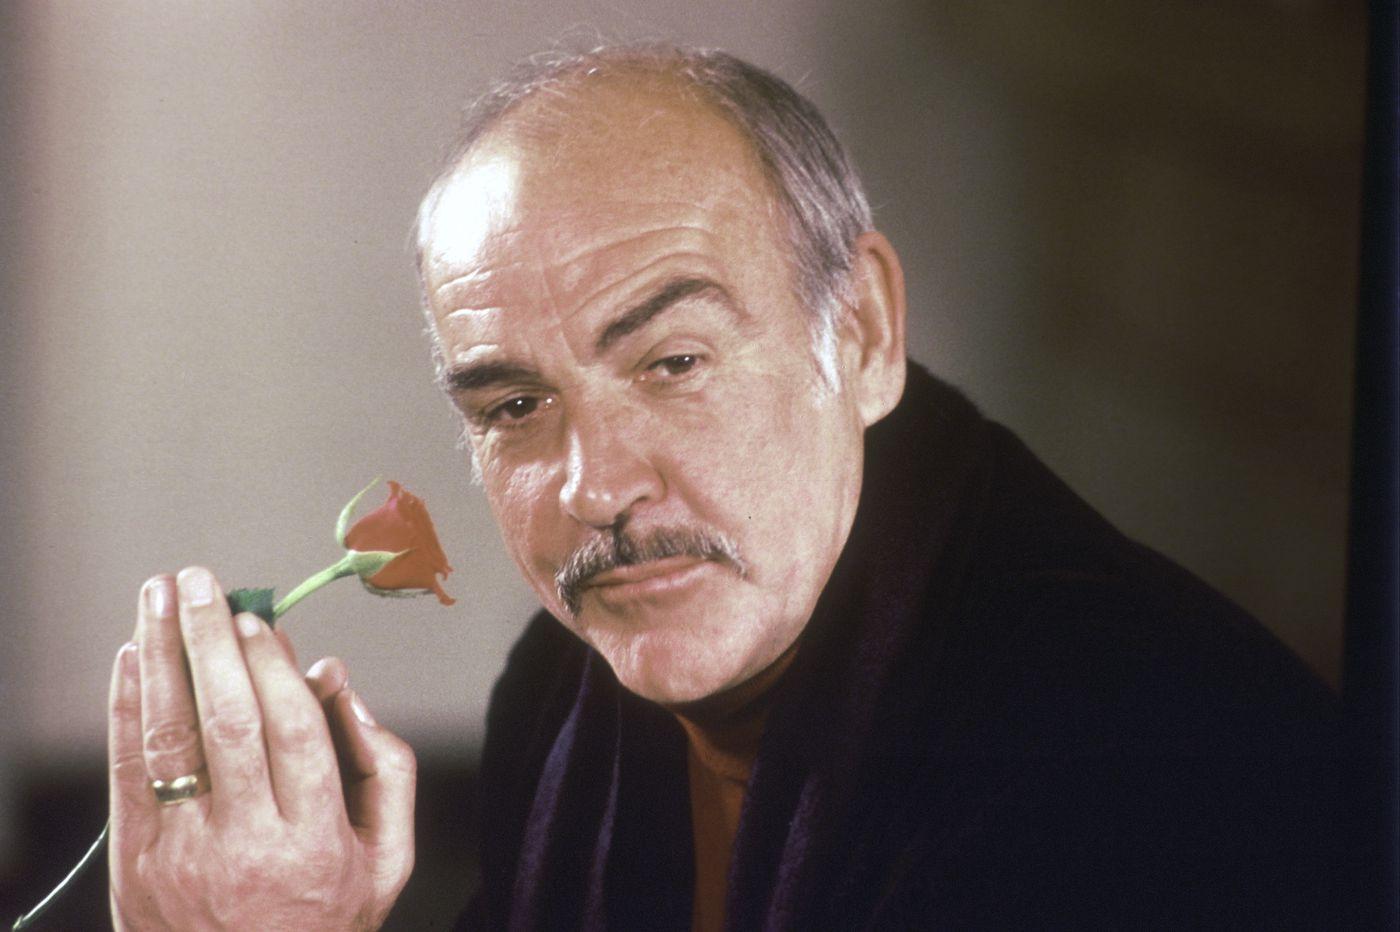 Actor Sean Connery, the 'original' James Bond, dies at 90